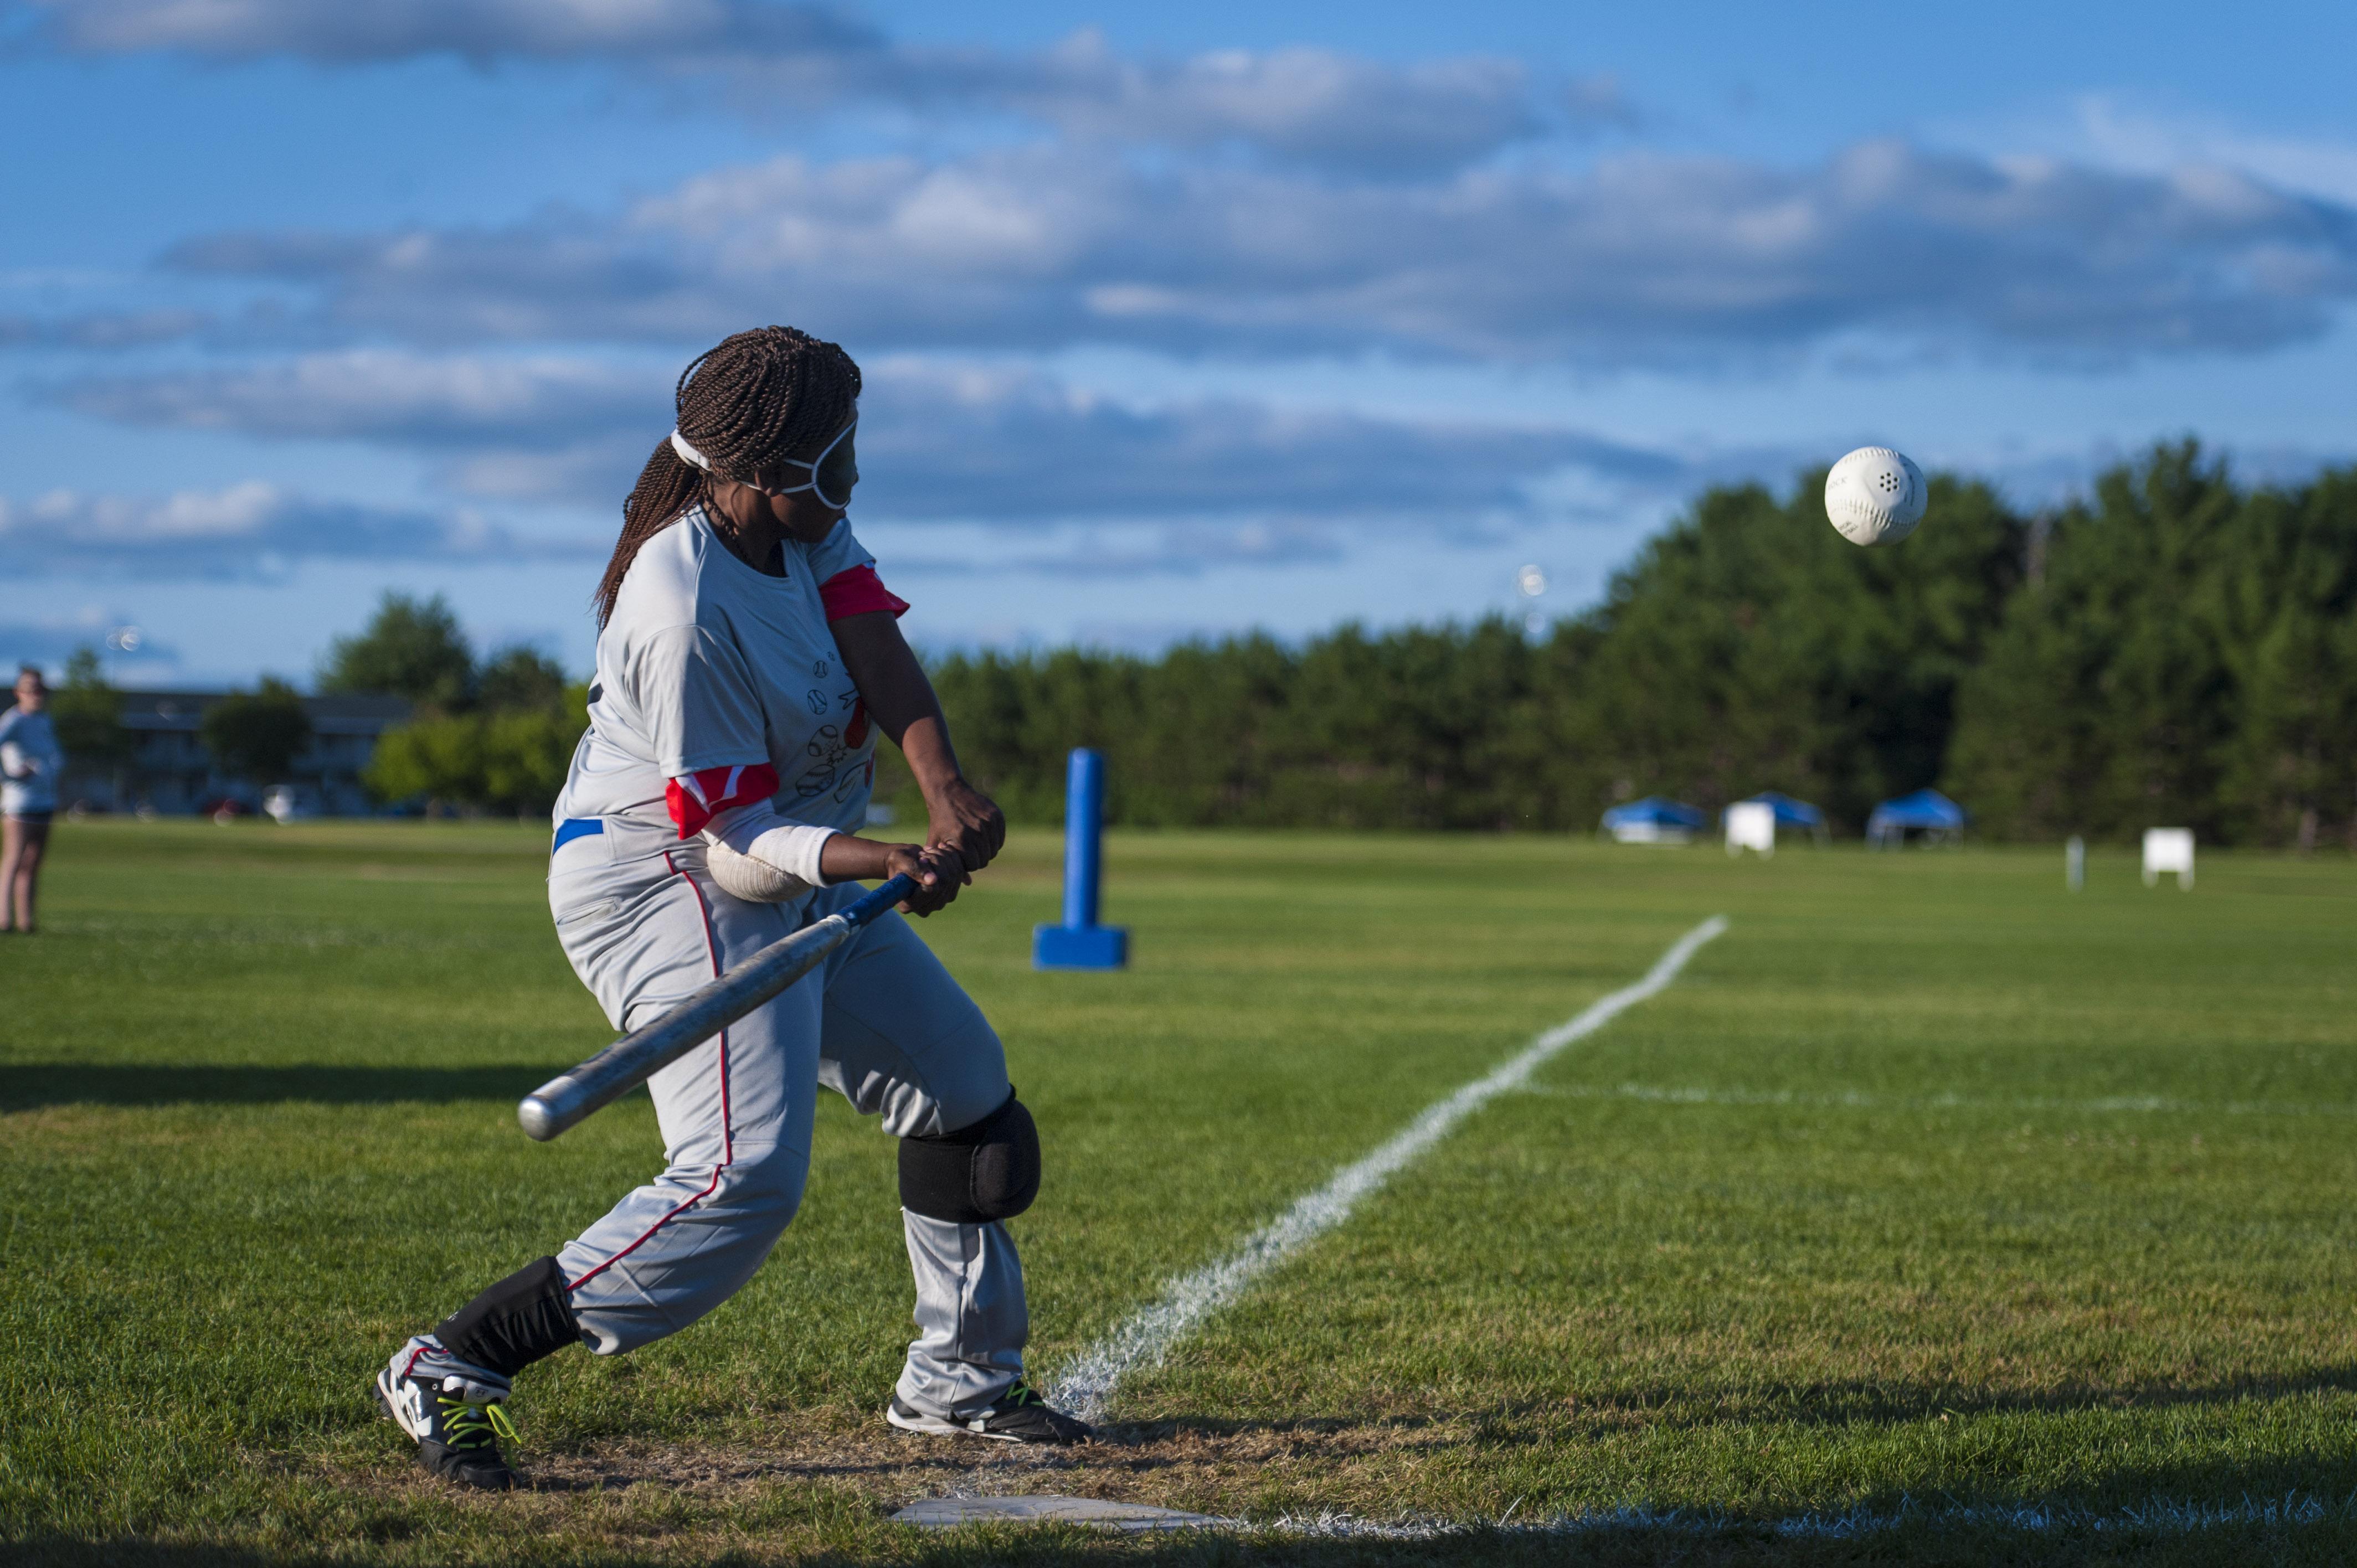 Image of Kalari swinging the bat during a beep baseball game